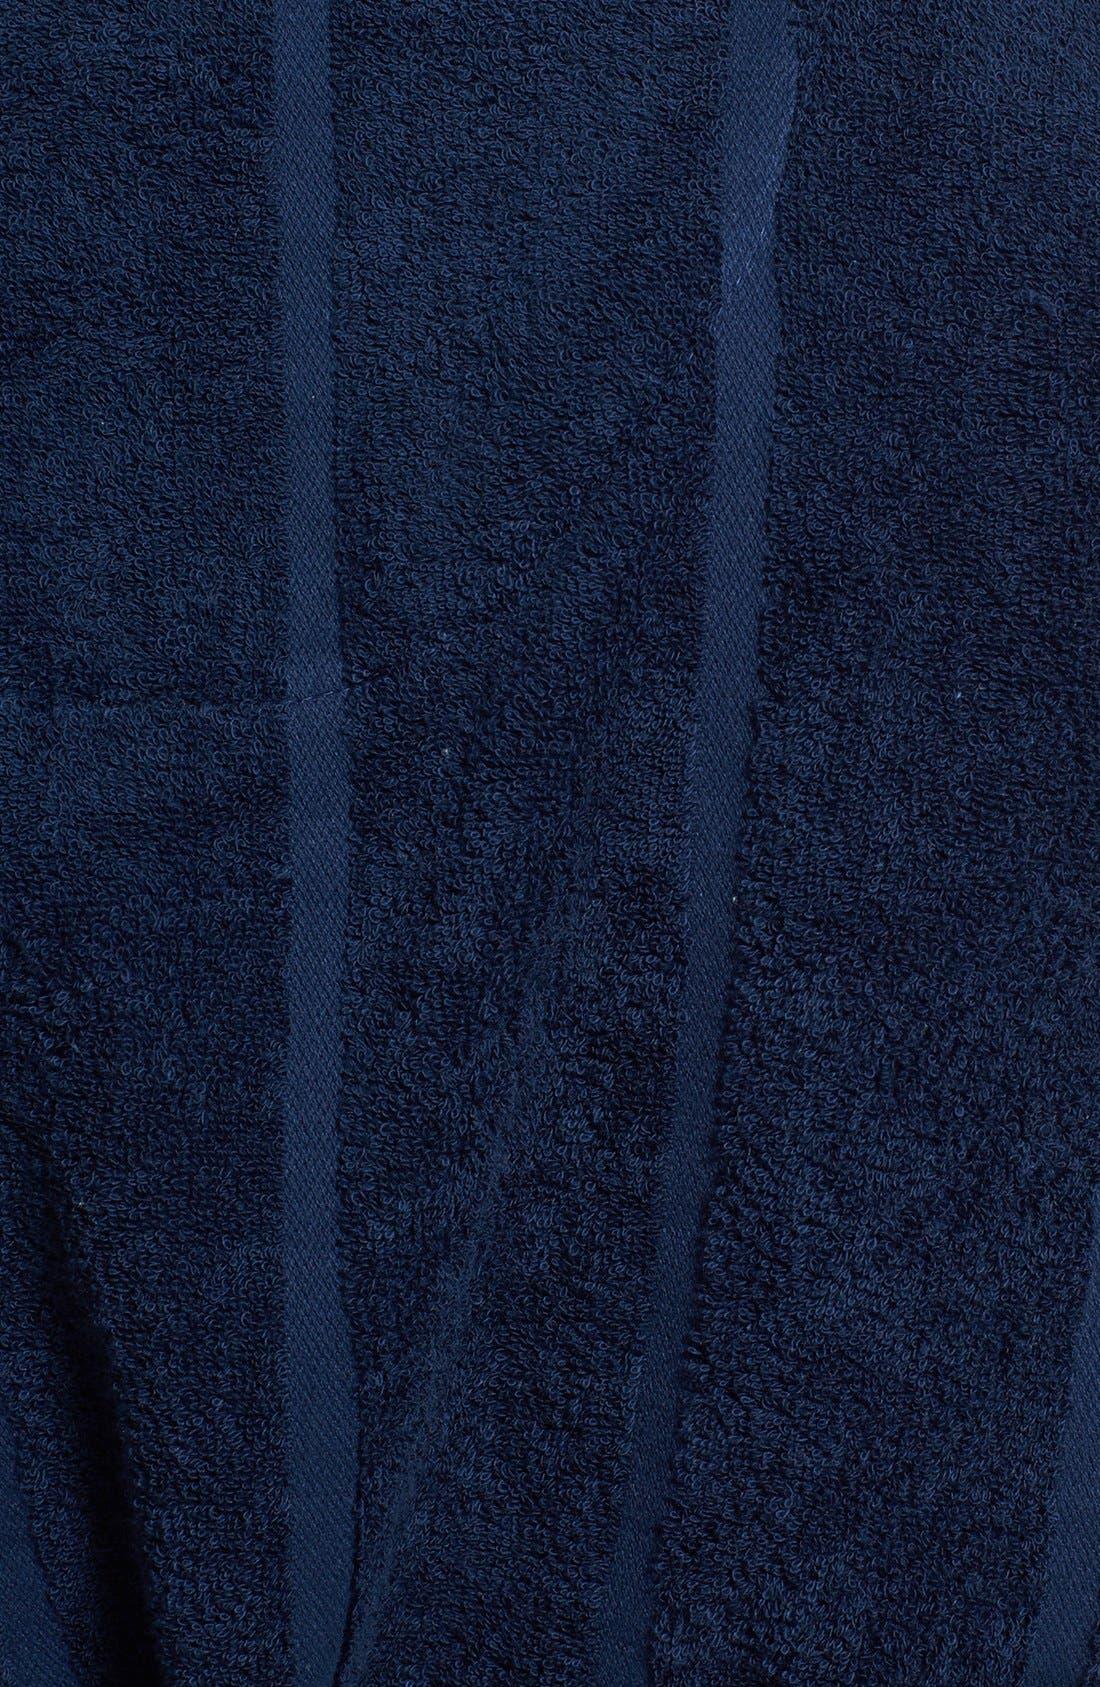 Ultra Lux Robe,                             Alternate thumbnail 2, color,                             Marine